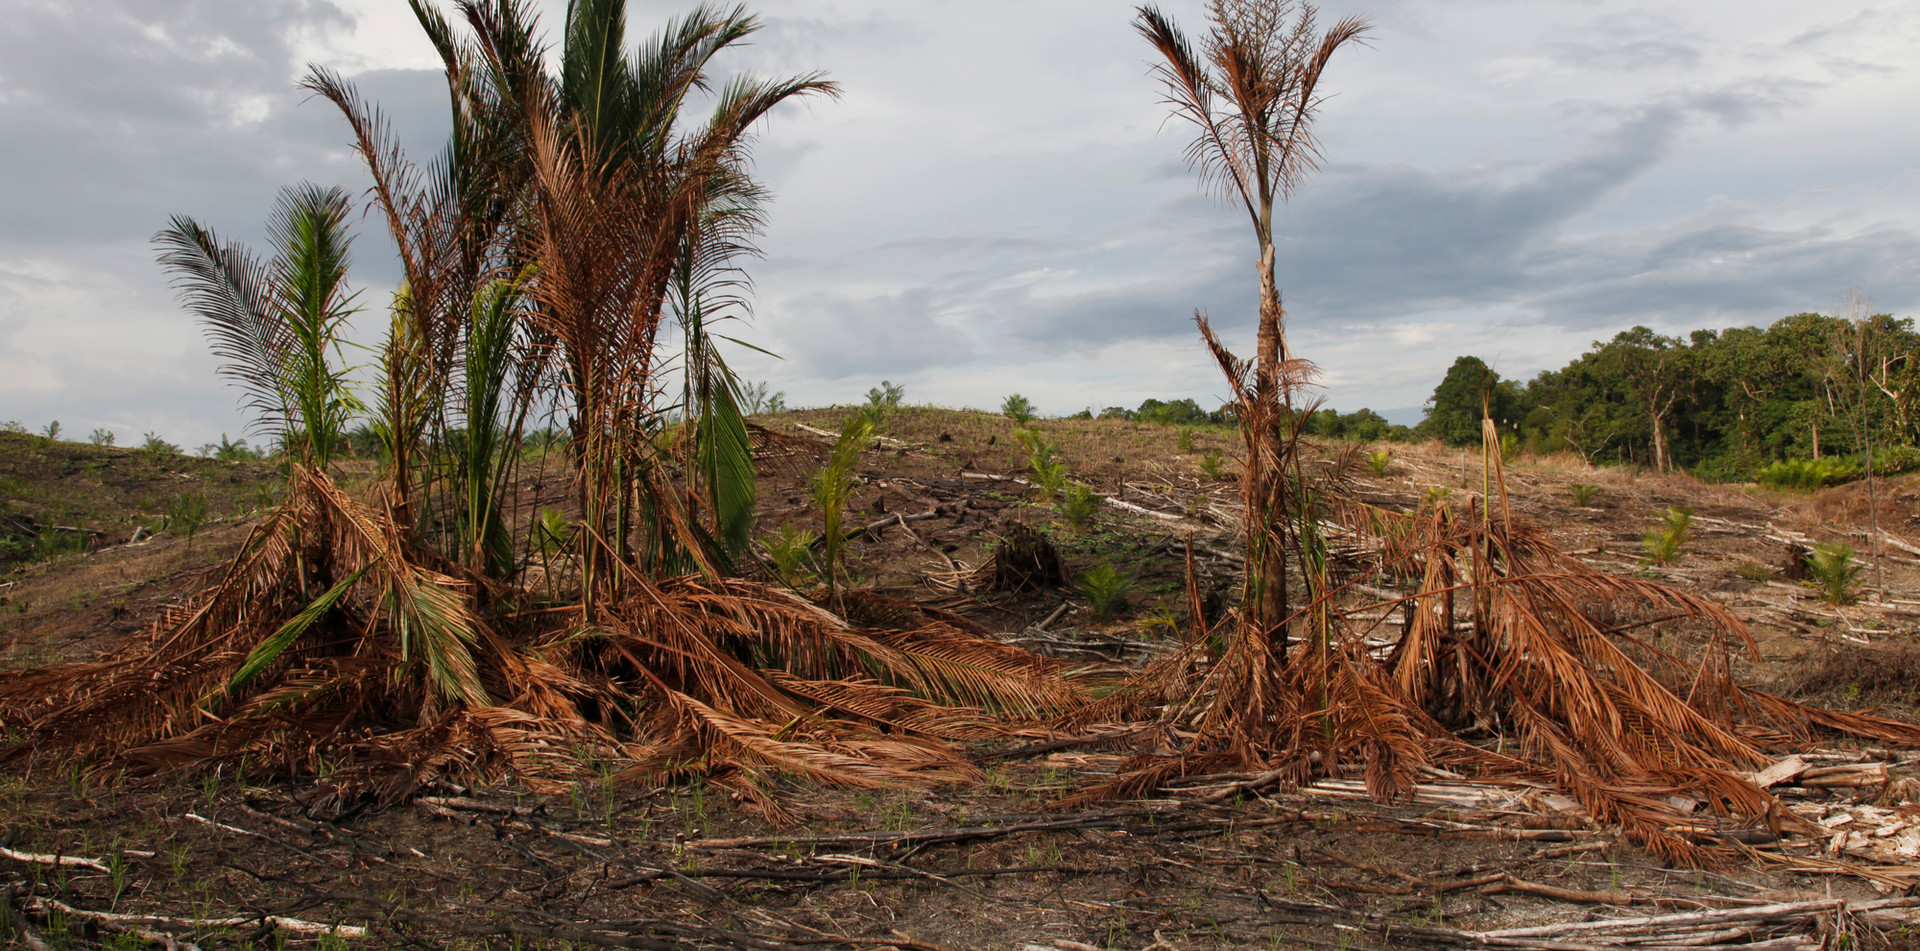 Deforestation to grow a palm oil plantation in Borneo, Malaysia